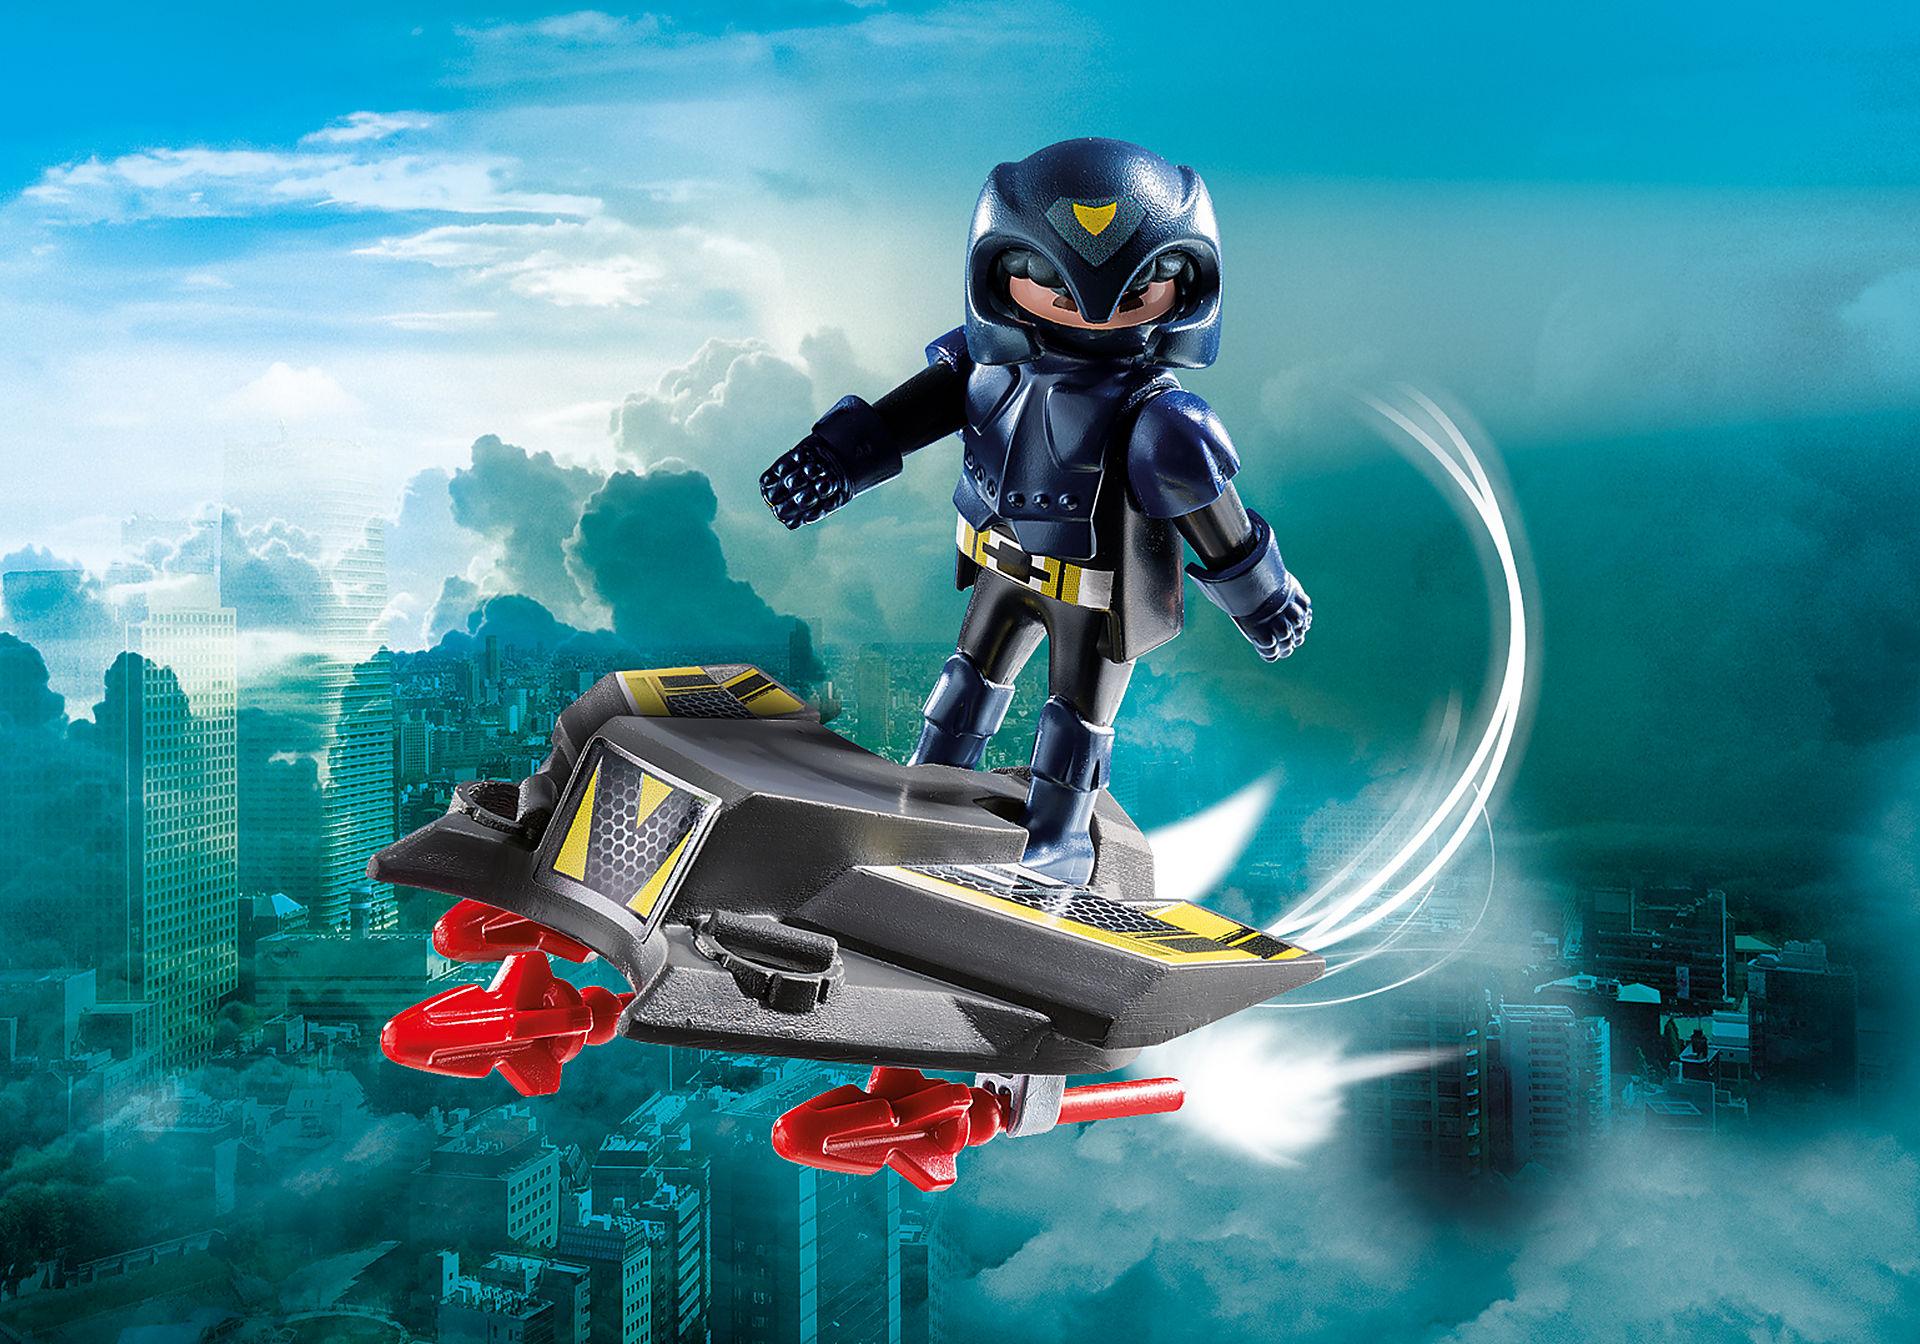 http://media.playmobil.com/i/playmobil/9086_product_detail/Sky Knight with Jet